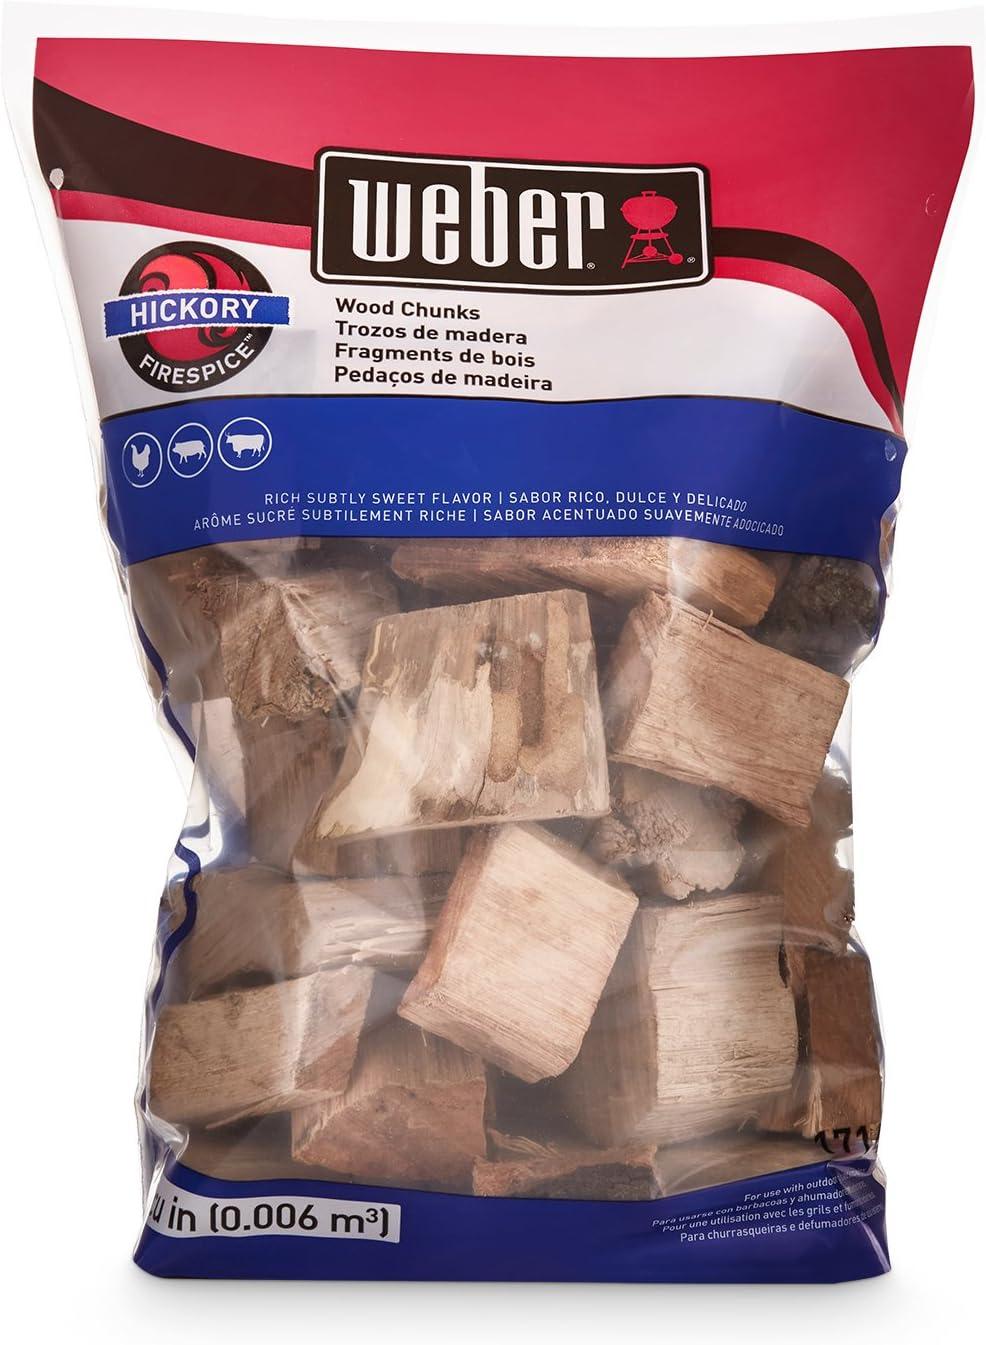 Weber 17148 Hickory 4 lbs Wood Chunks